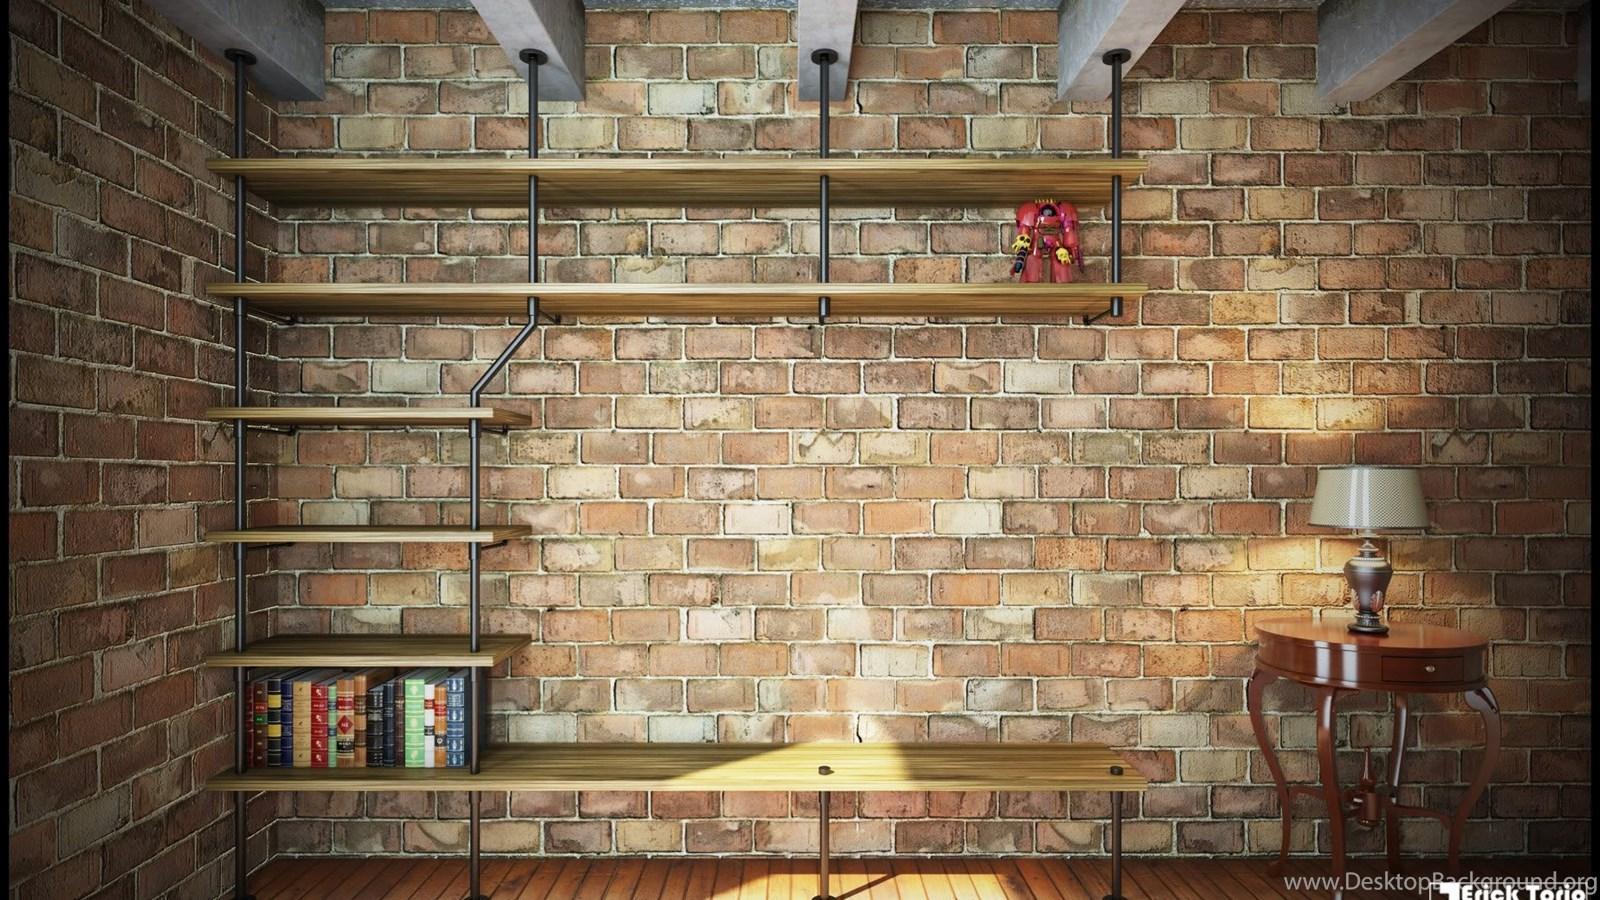 Shelf Wallpapers HD 5 Pix77 Desktop Background